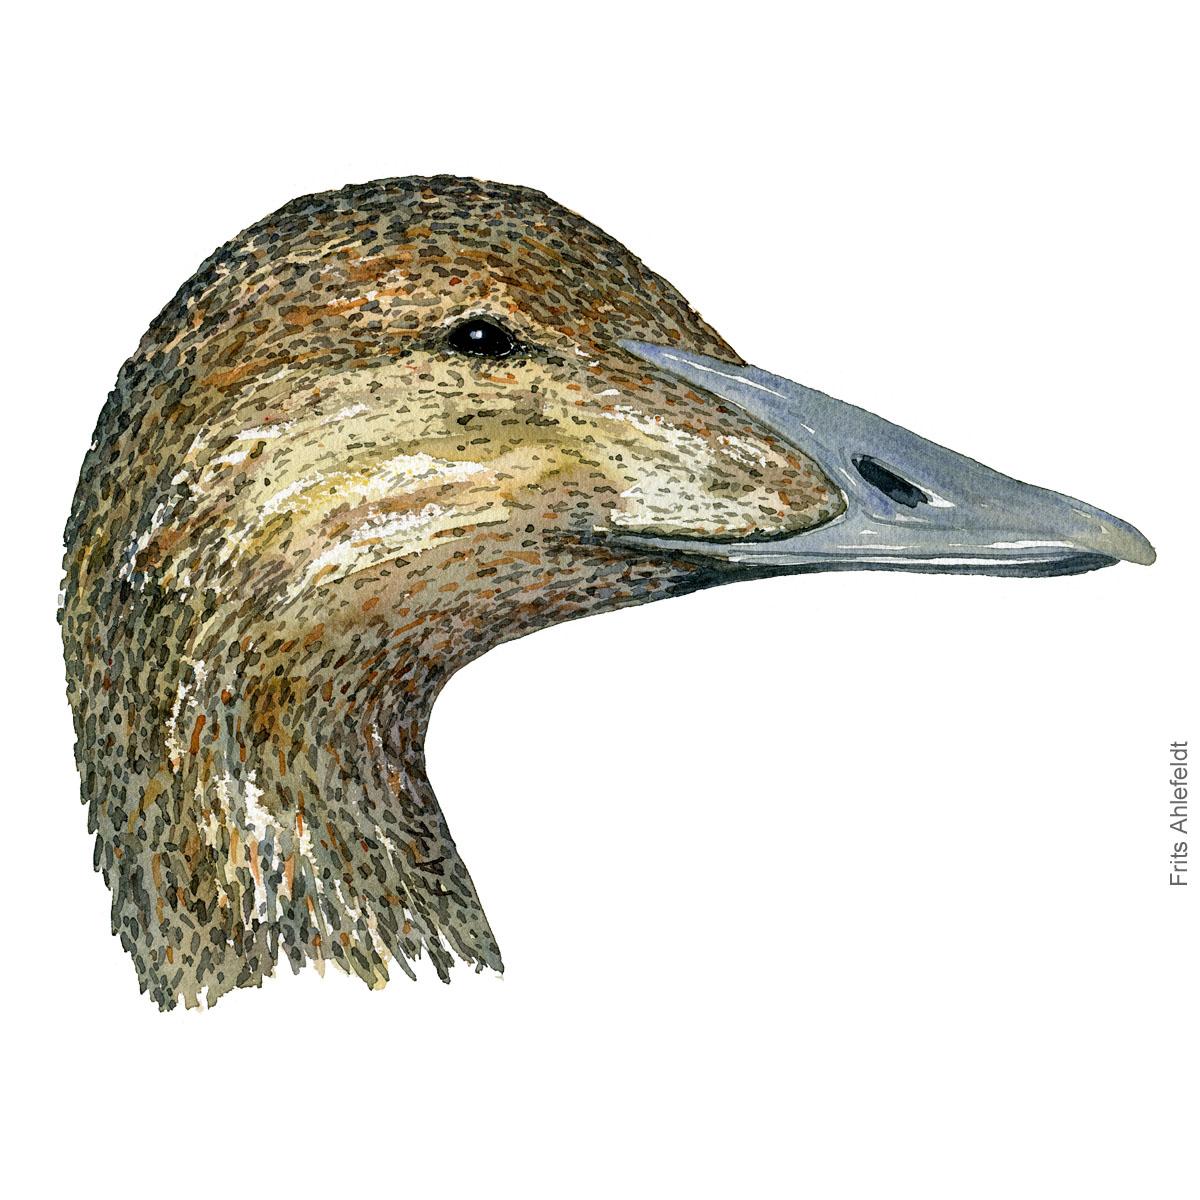 Edderfugl hun - Female Eider duck bird watercolor illustration. Artwork by Frits Ahlefeldt. Fugle akvarel